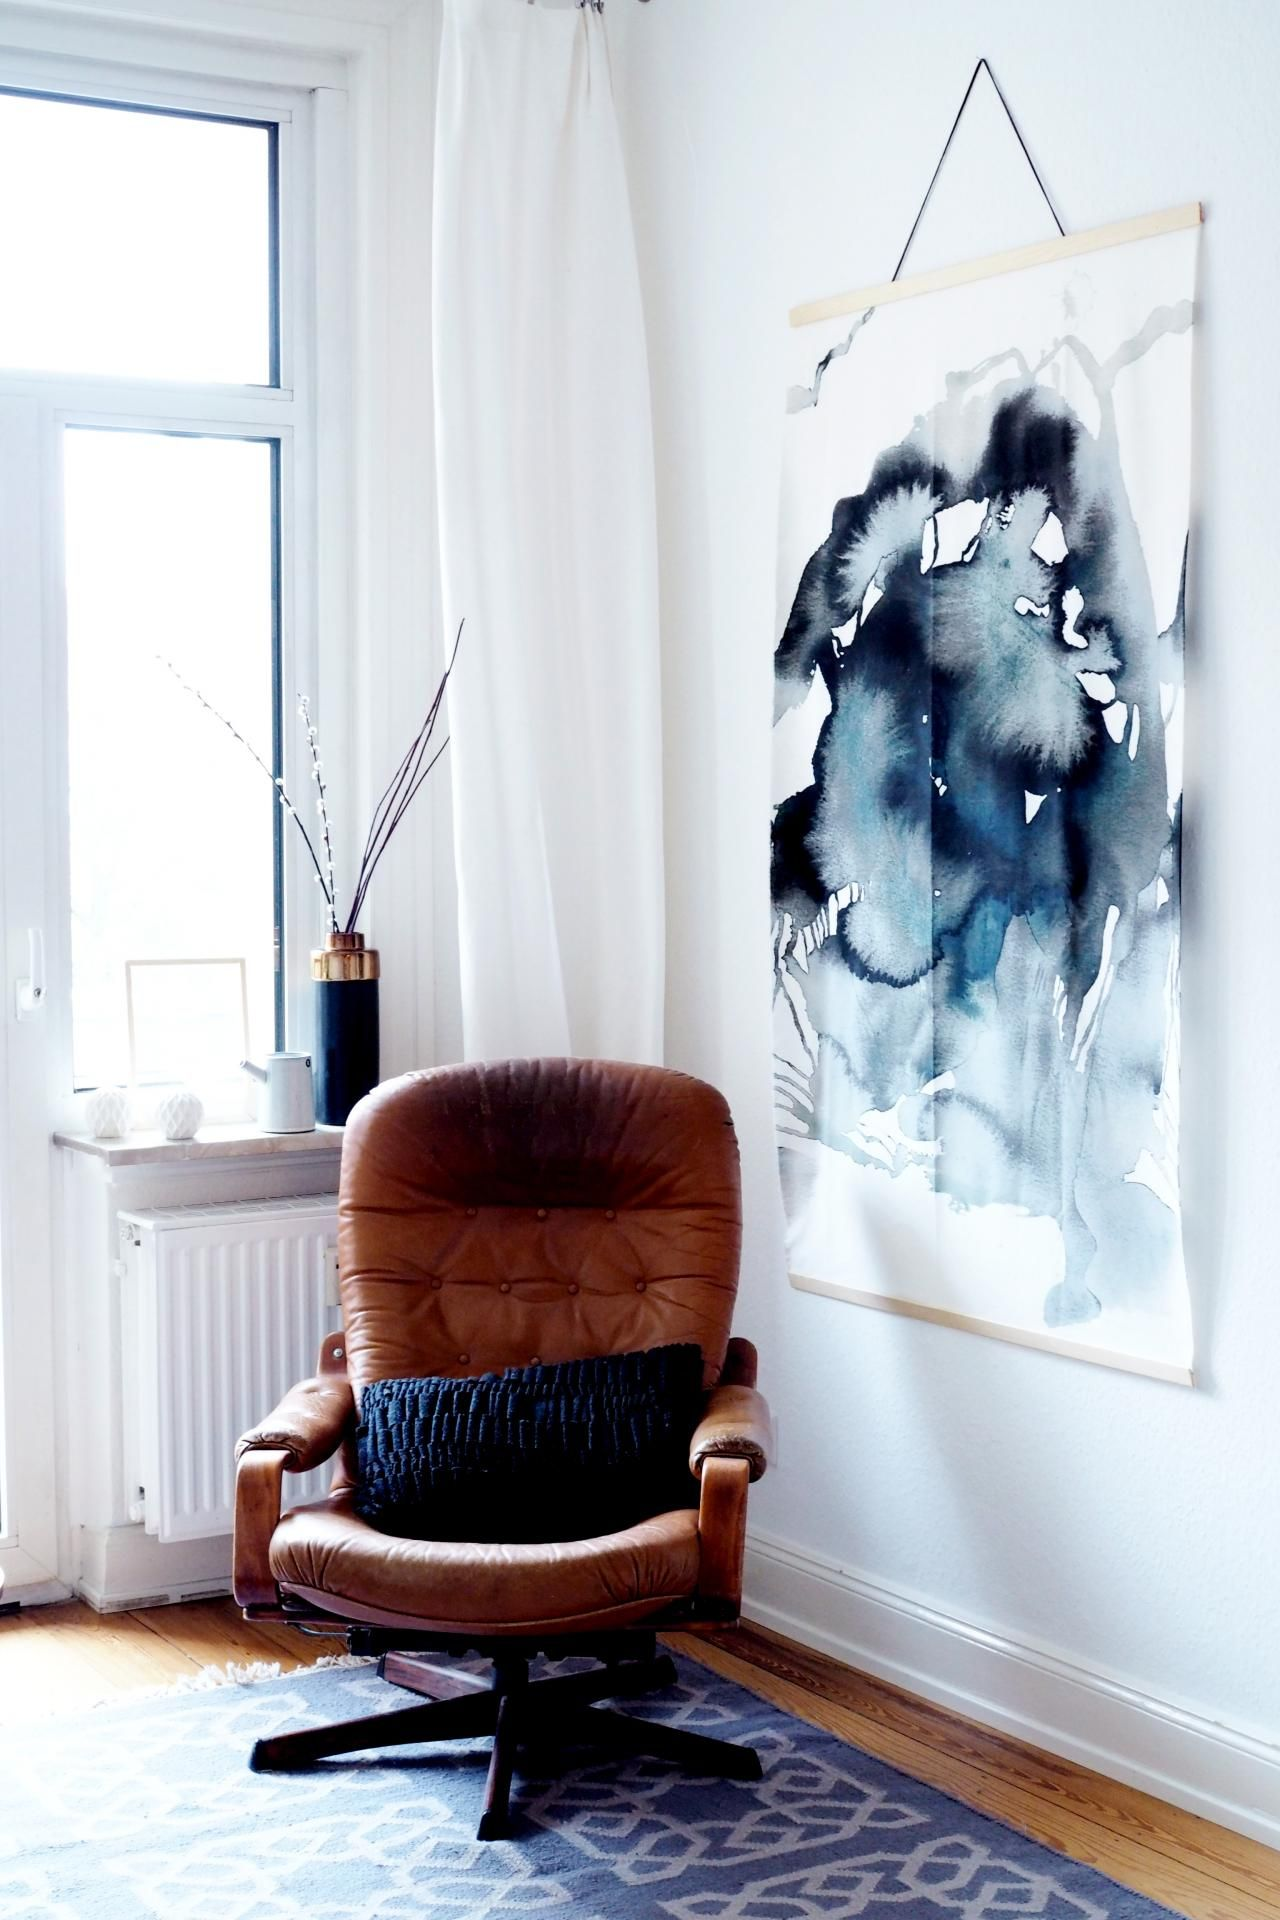 Attractive Wandbilder Selbst Gestalten Ideas Of Ikea Hack: Diy-aquarell-bild Im Großformat | Wall